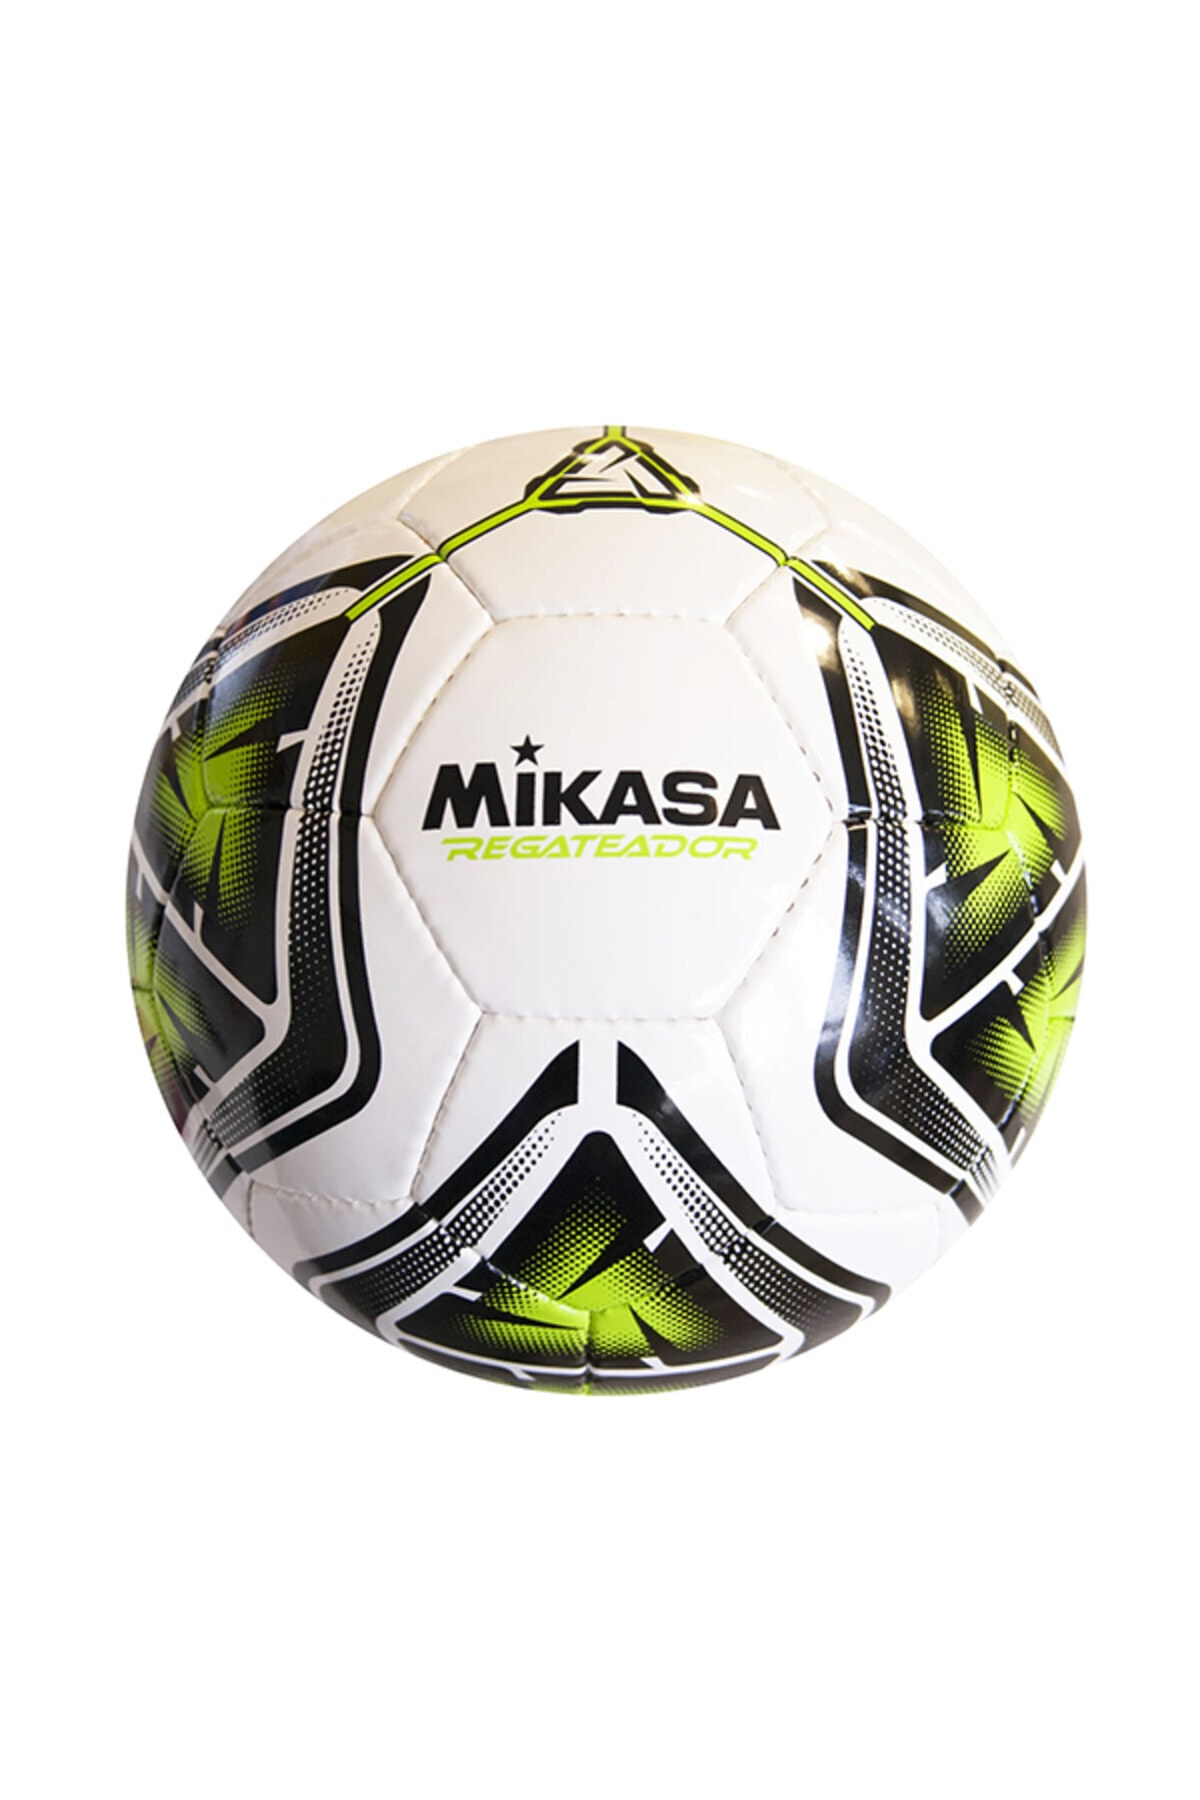 MIKASA Beyaz Yeşil Futbol Topu Regateador5-g 2